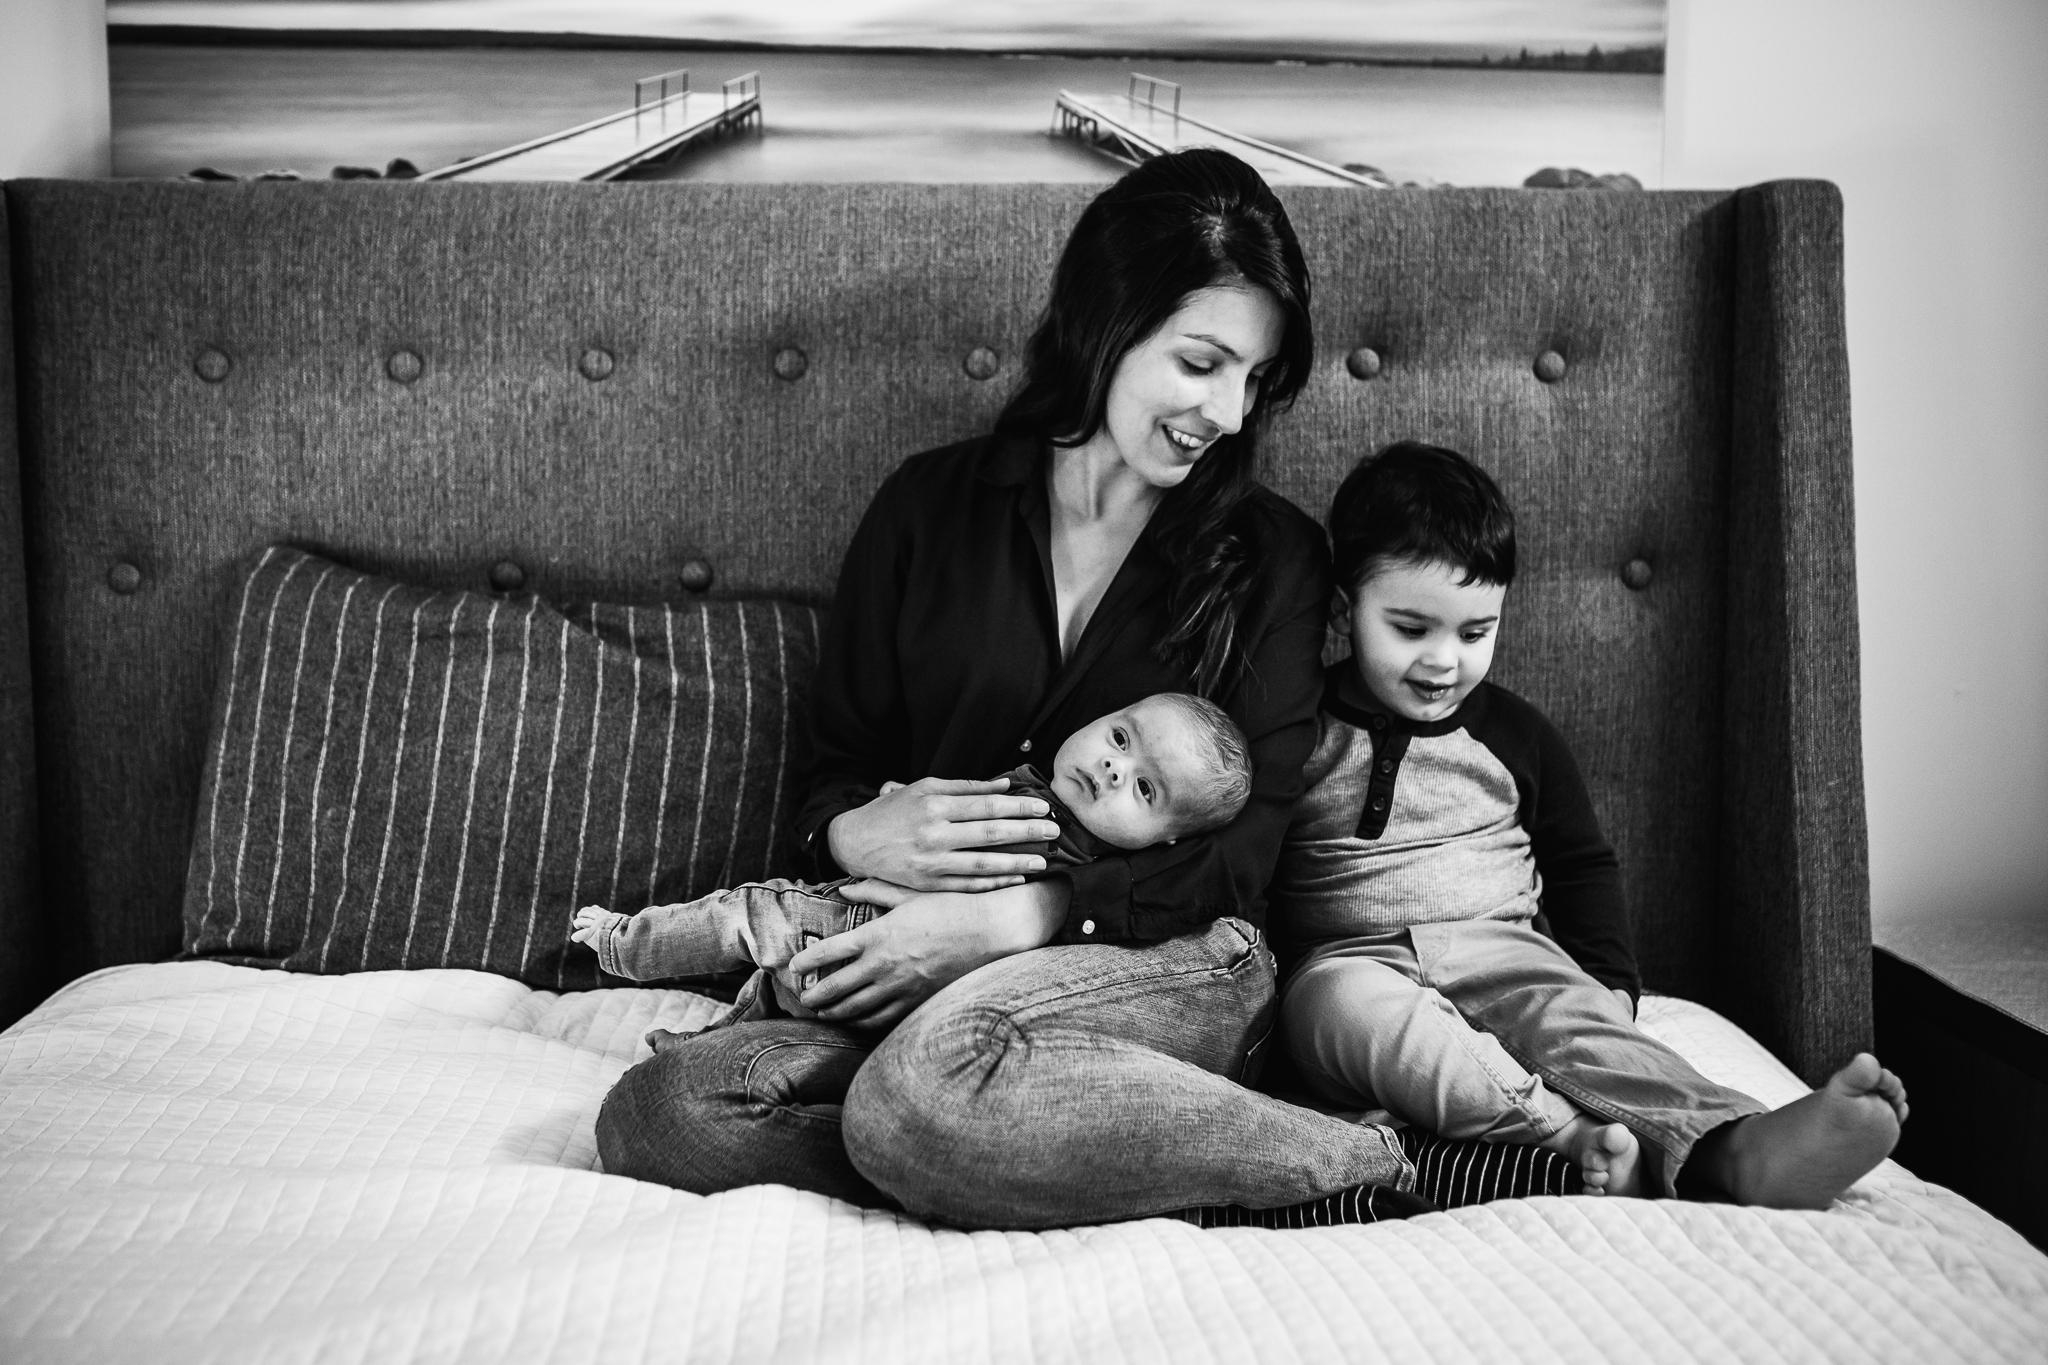 Alina-Joy-Photography-Cold-Lake-Photographer-3-12.jpg